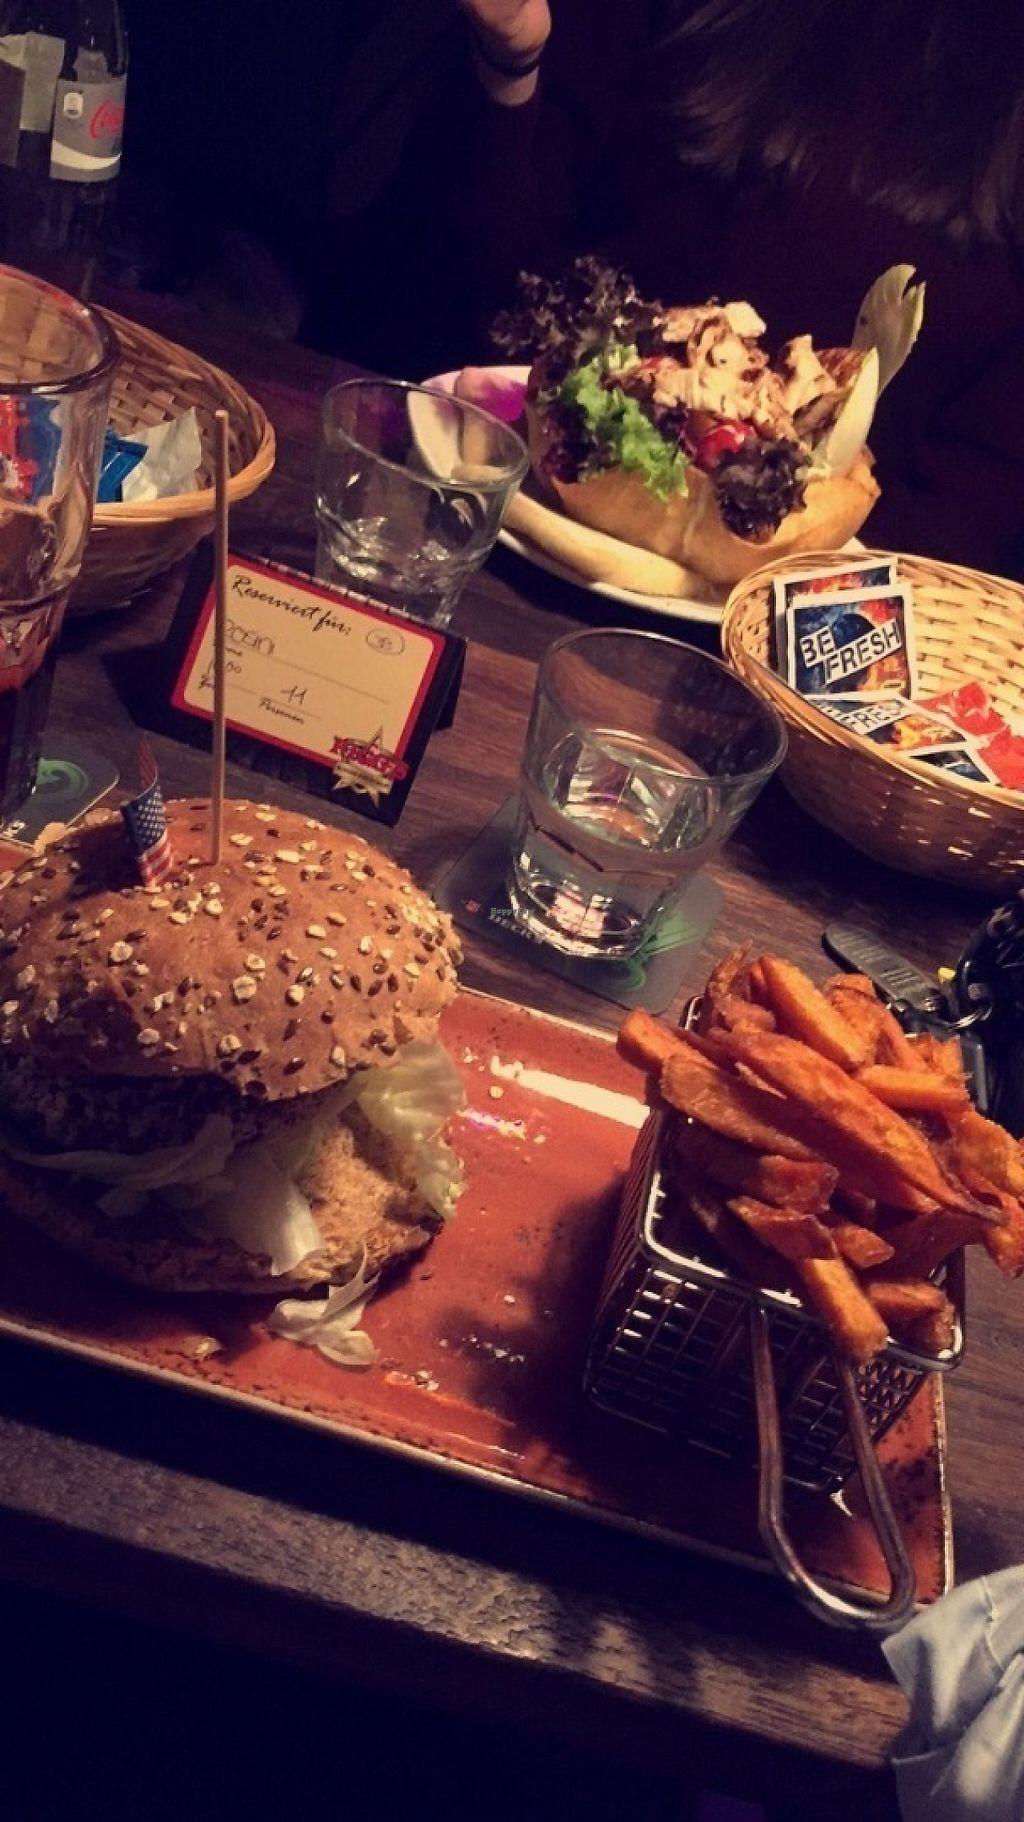 "Photo of Riggs Burger Restaurant  by <a href=""/members/profile/NinaHirt"">NinaHirt</a> <br/>Vegan burger & sweet potato fried <br/> May 27, 2017  - <a href='/contact/abuse/image/69657/262919'>Report</a>"